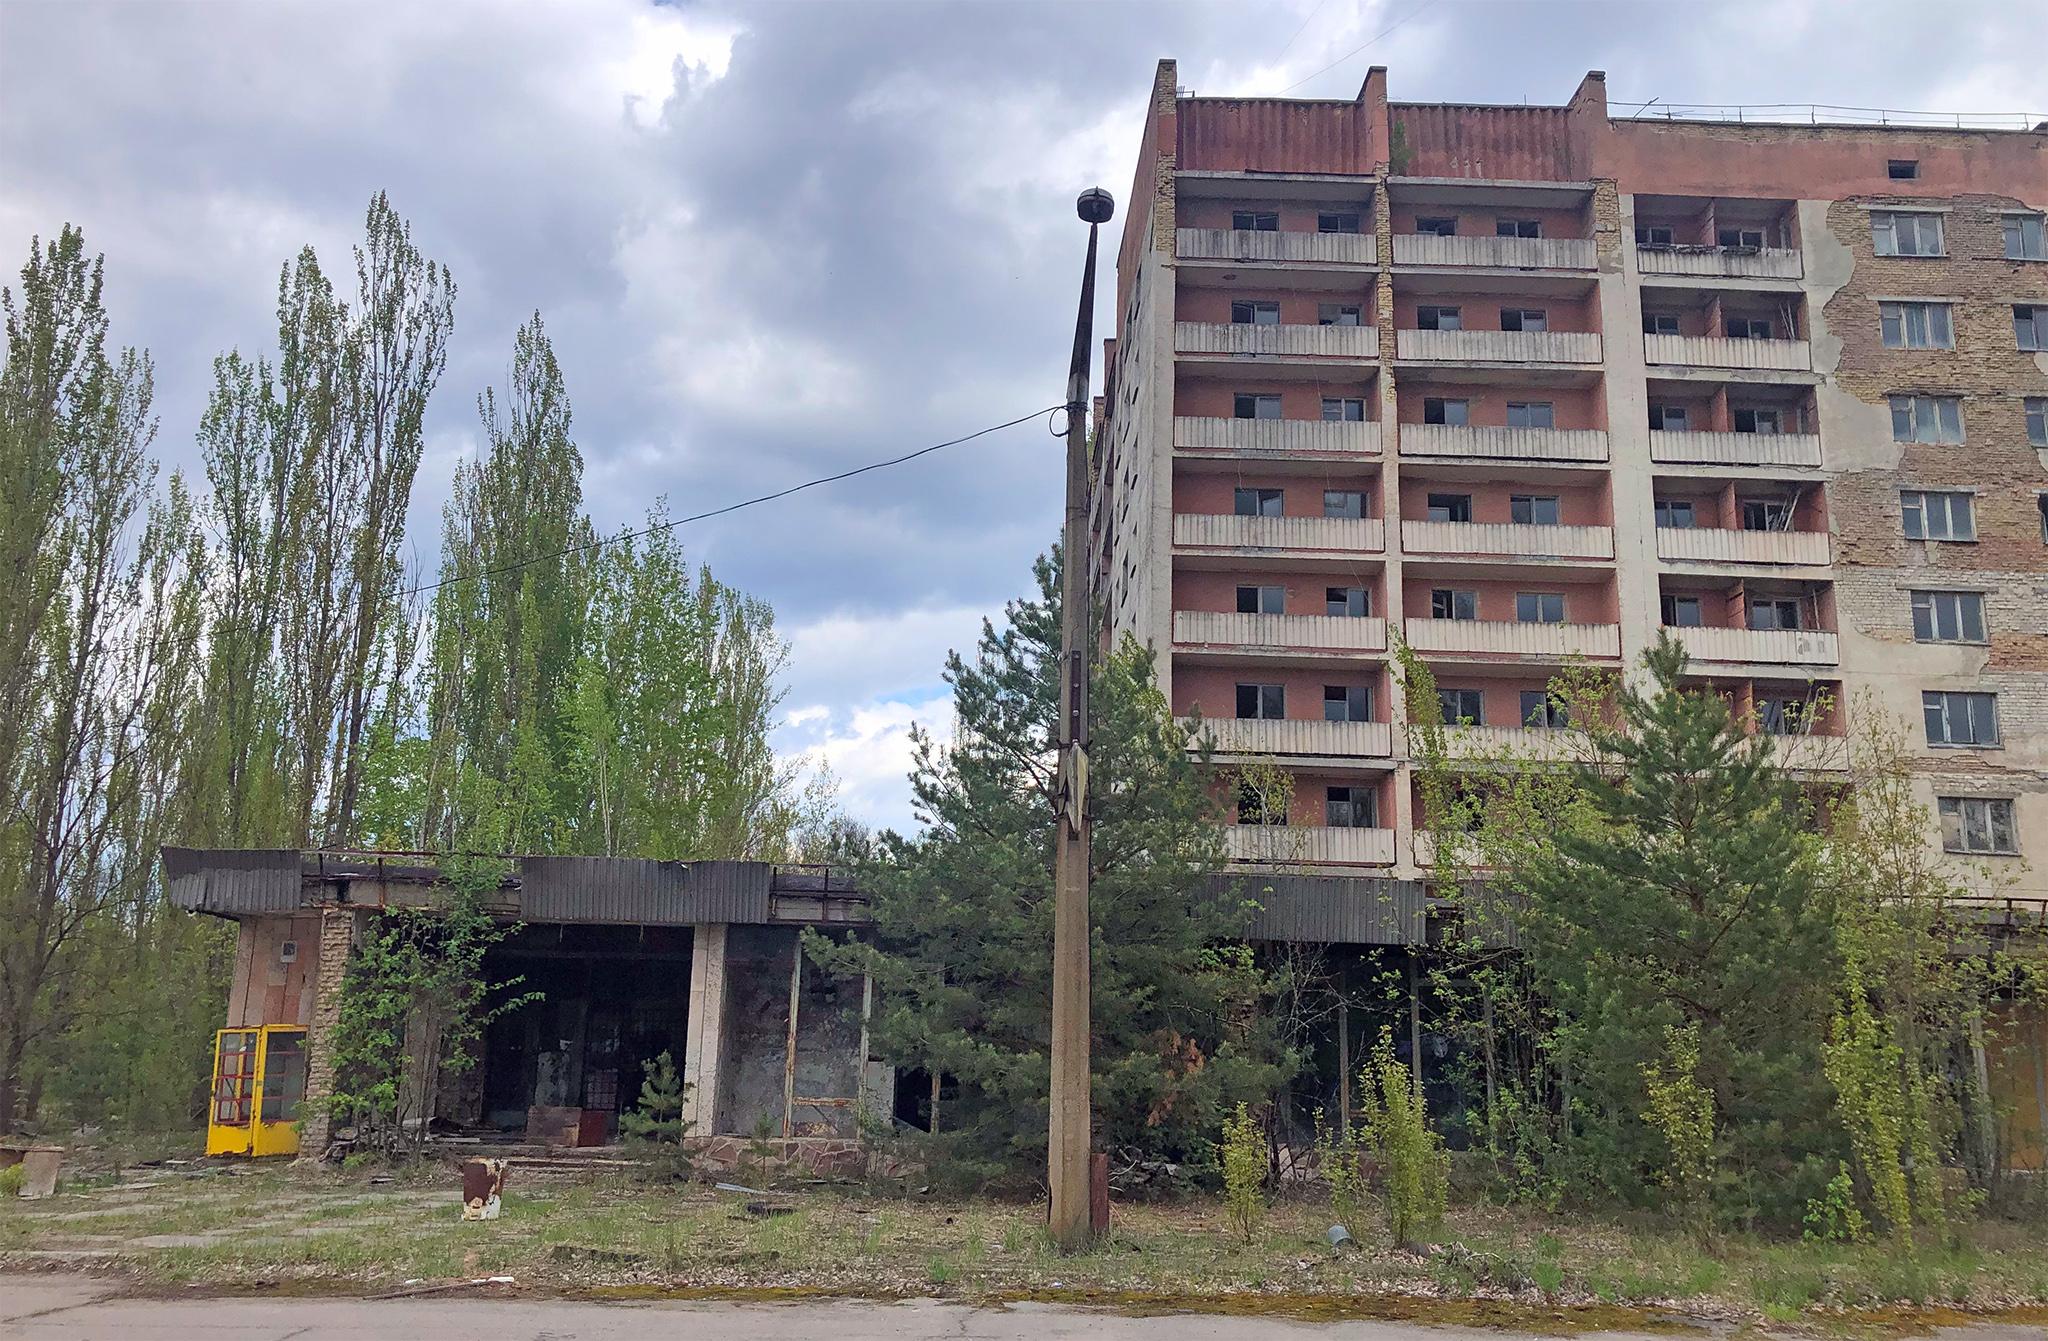 Visitar Chernóbil - Visitar Chernobyl Ucrania Ukraine Pripyat visitar chernóbil - 47835382841 a0ca4d4a90 o - Visitar Chernóbil: el lugar más contaminado del planeta